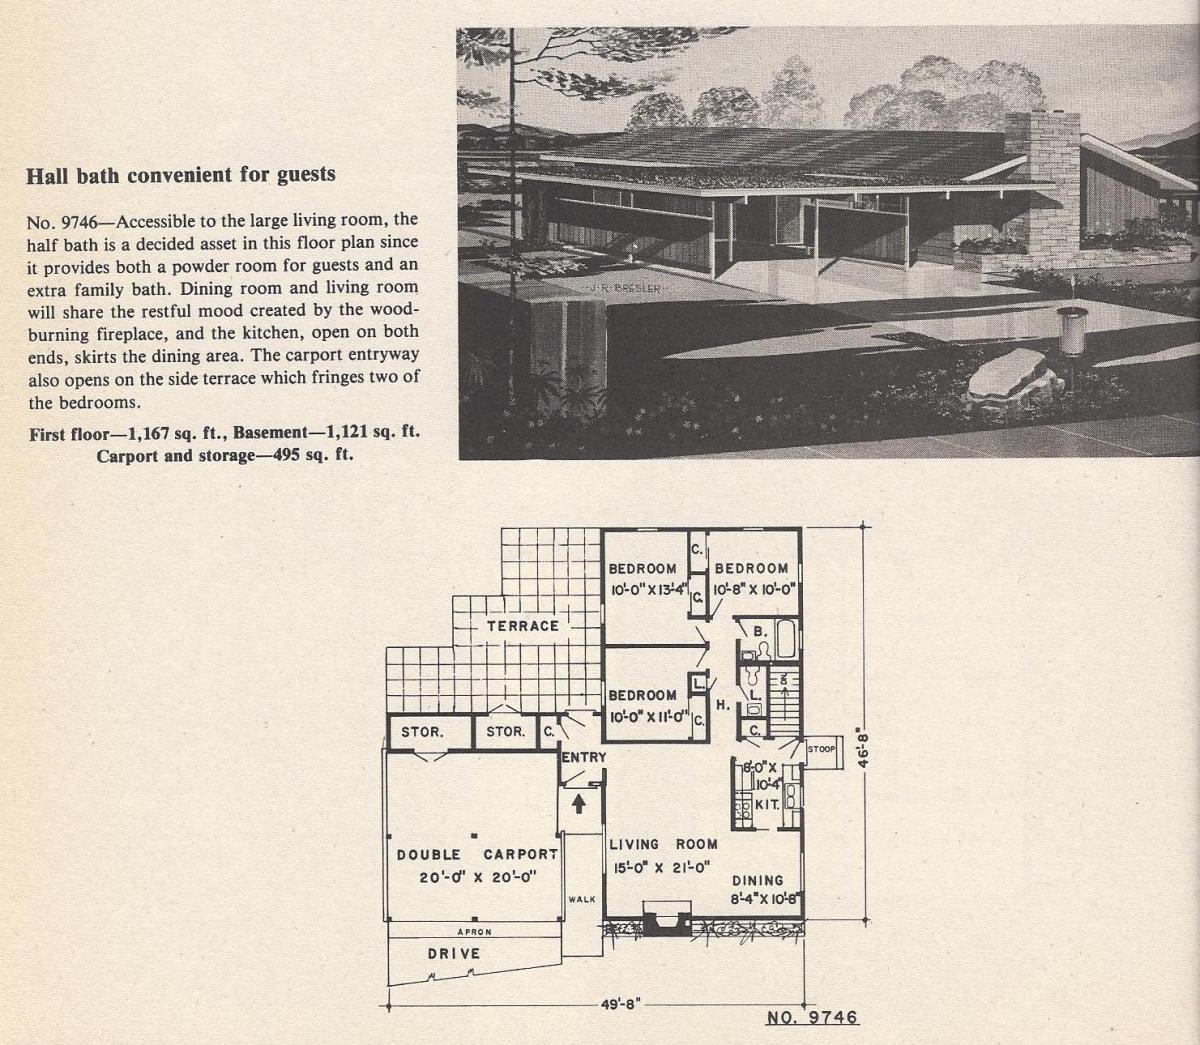 Vintage House Plans, Hall Bath